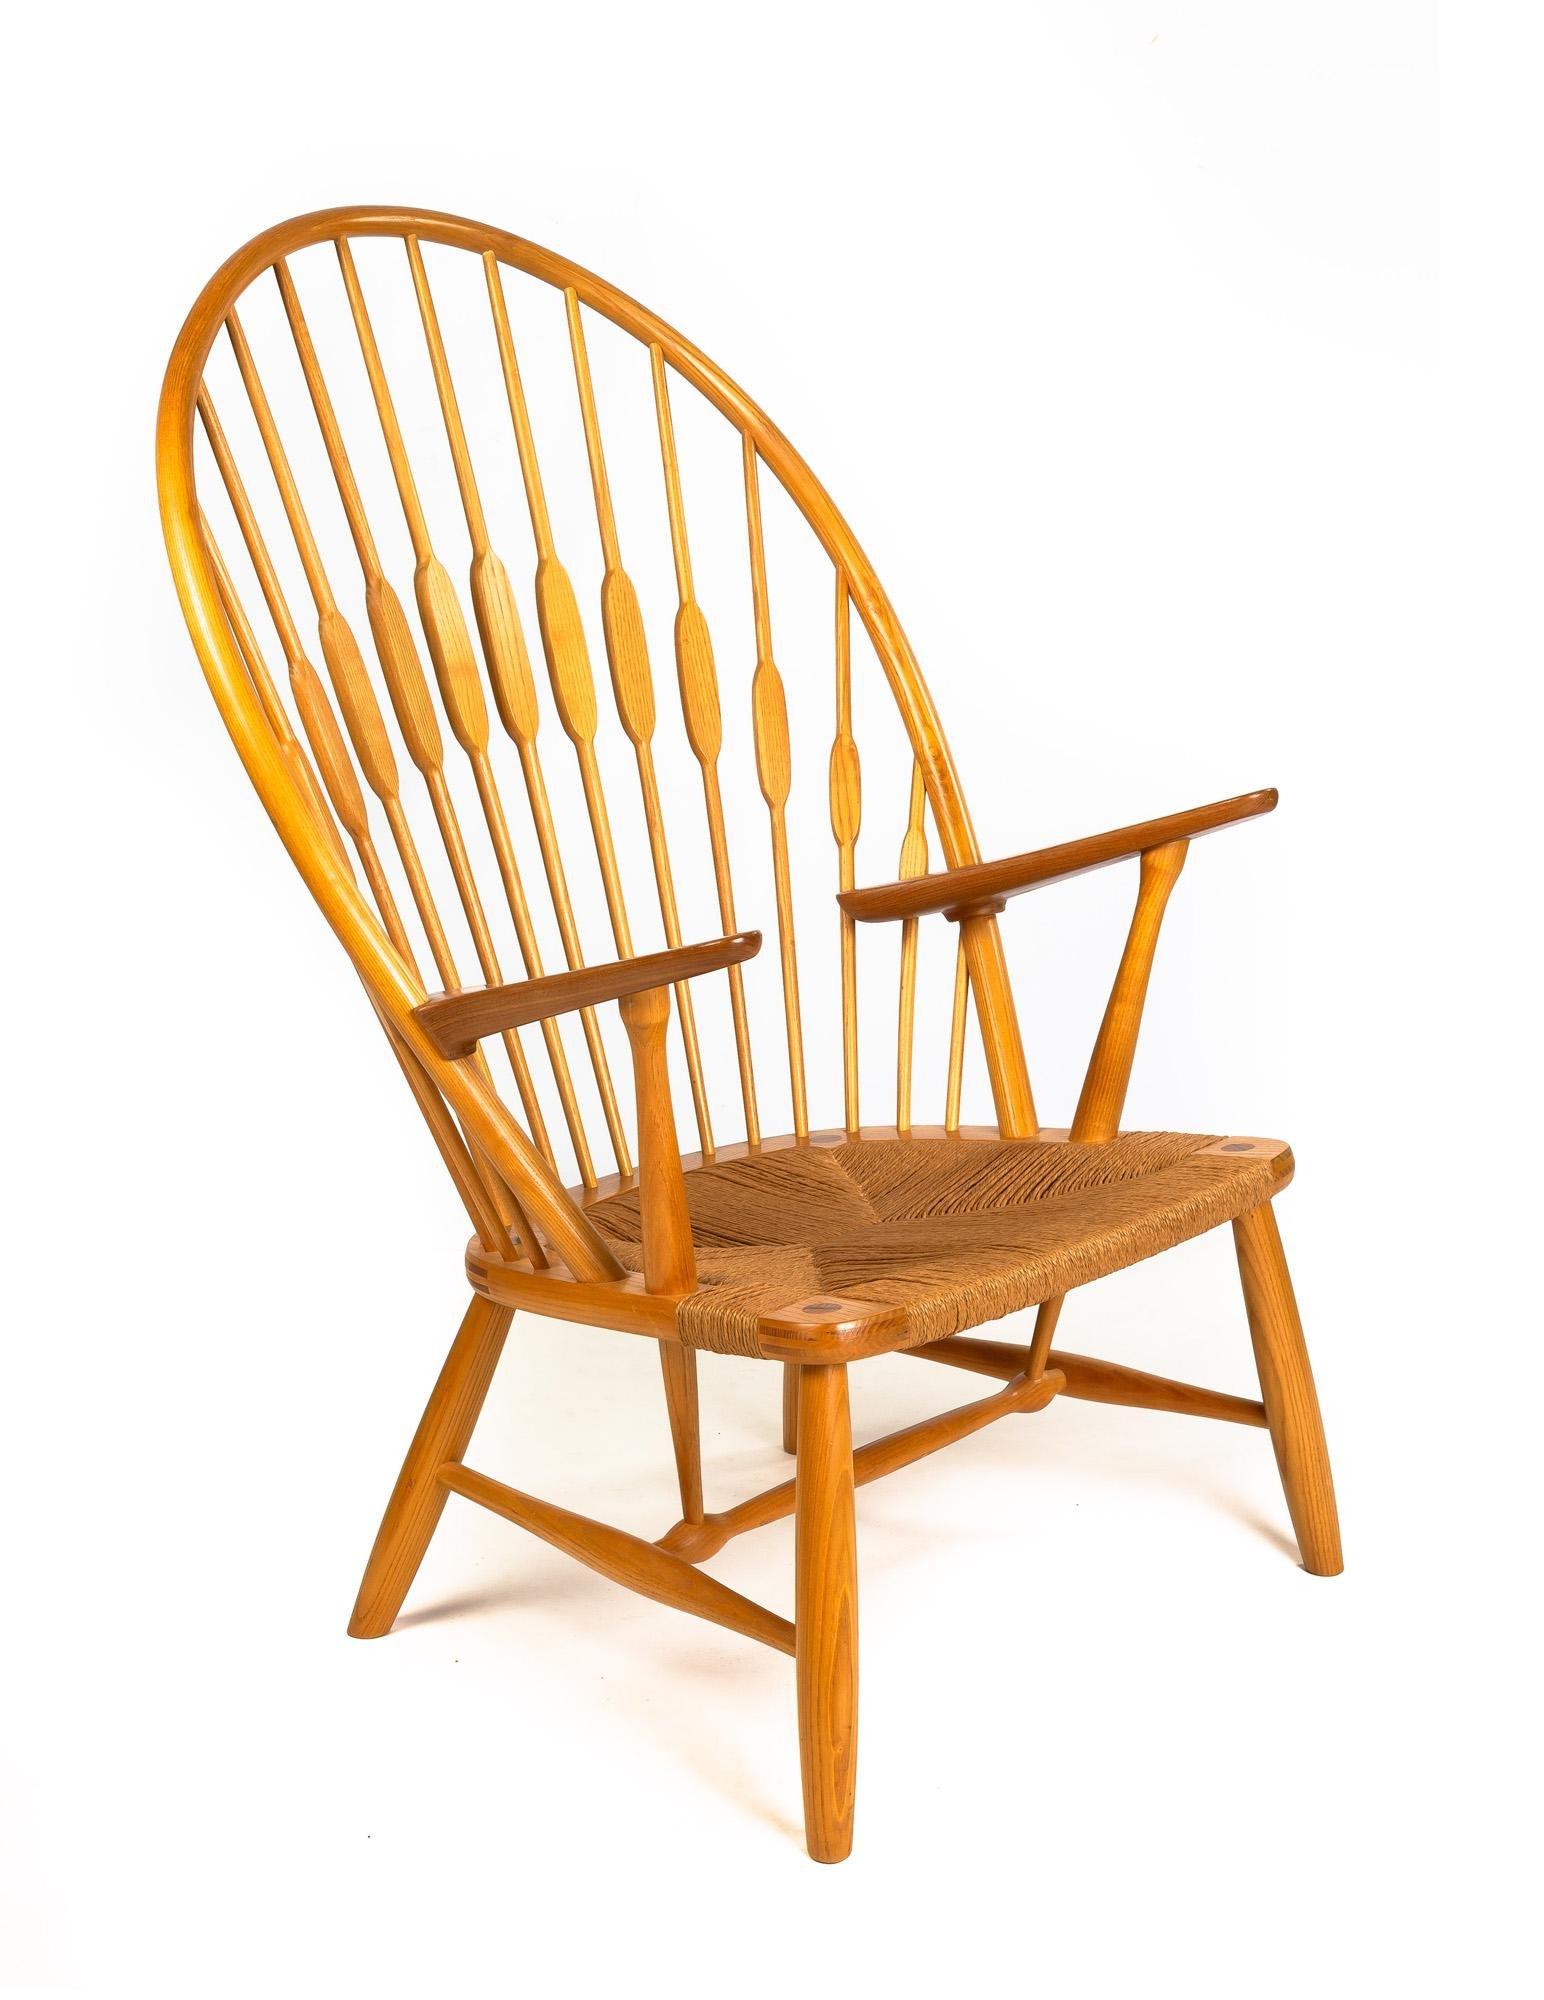 "Hans J. Wegner (Danish, 1914-2007) ""Peacock"" Chair"